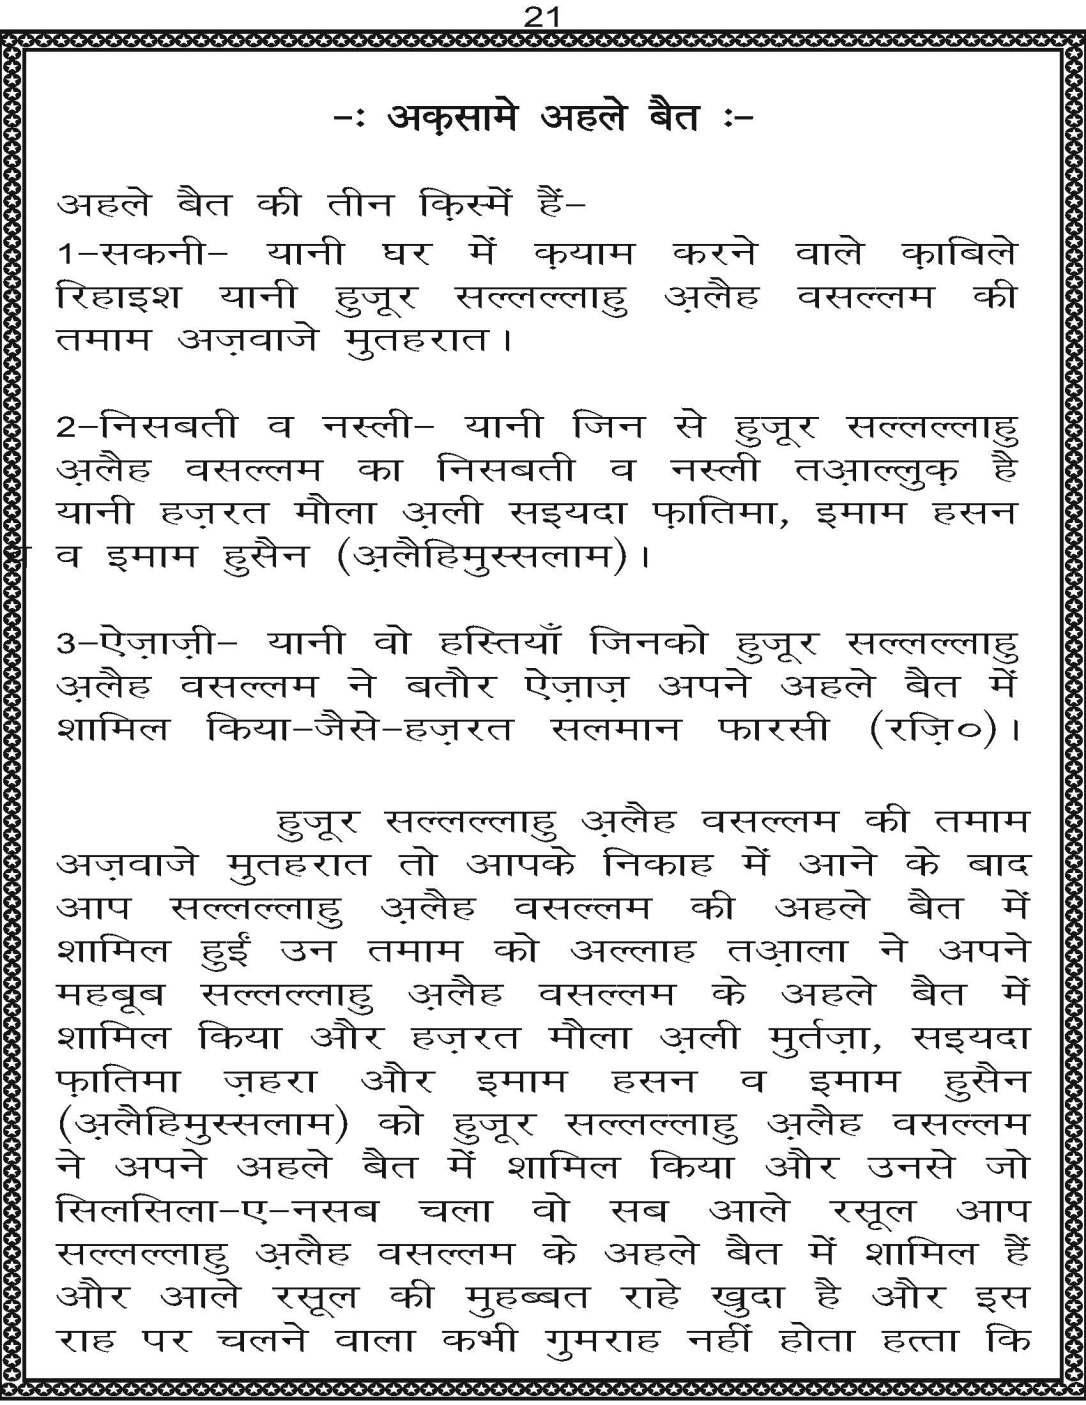 AzmateTaziyadari_Page_021